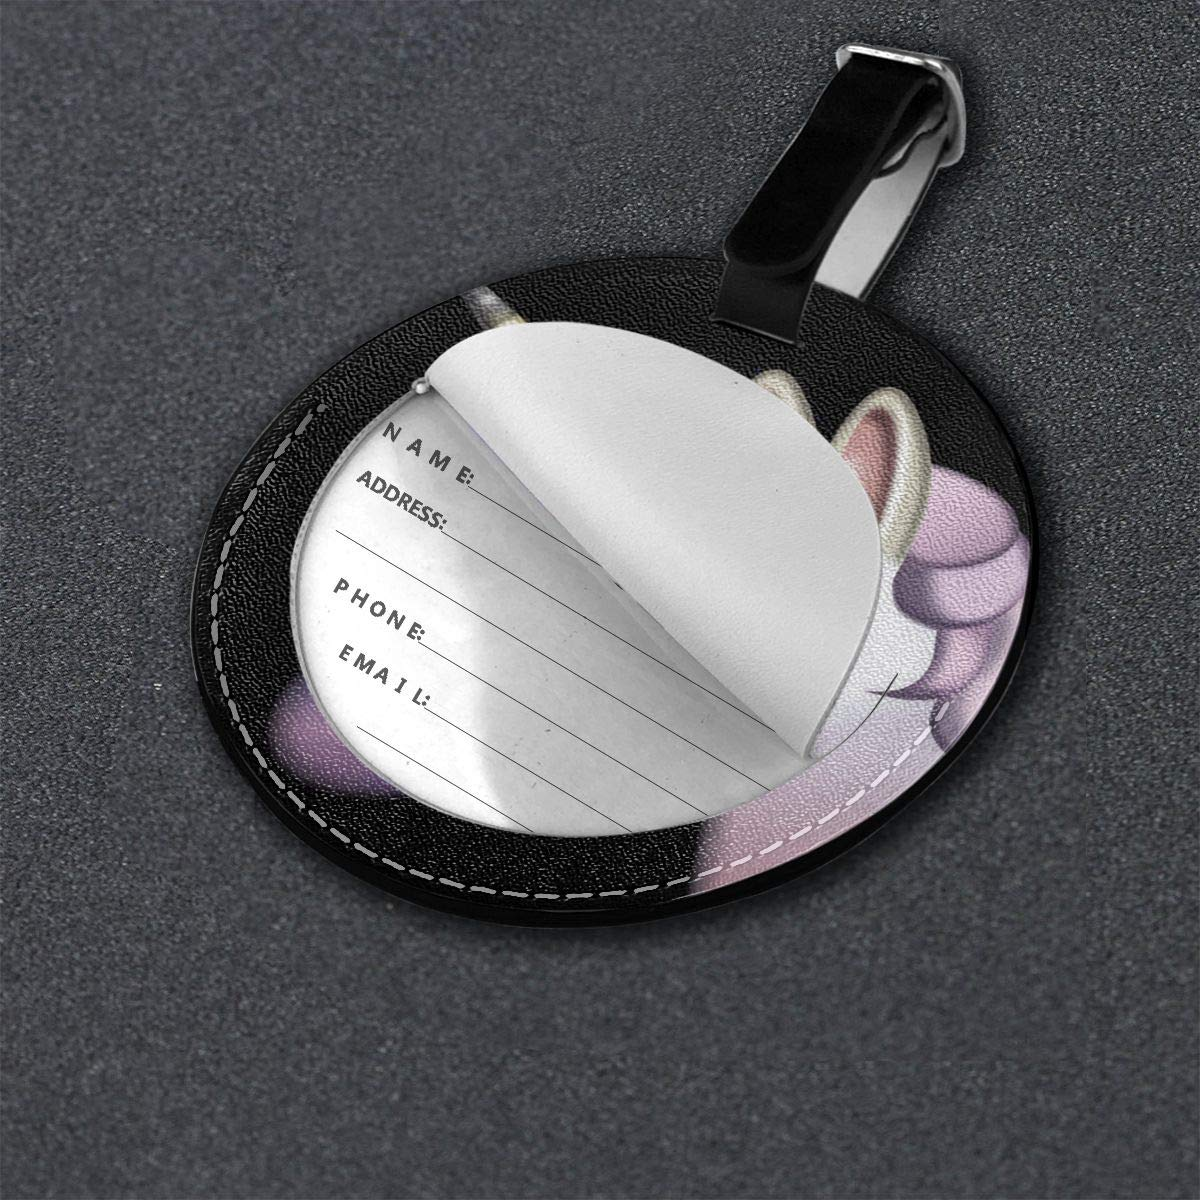 Free-2 Unicorn/_Emoji Grande Luggage Tag 3D Print Leather Travel Bag ID Card